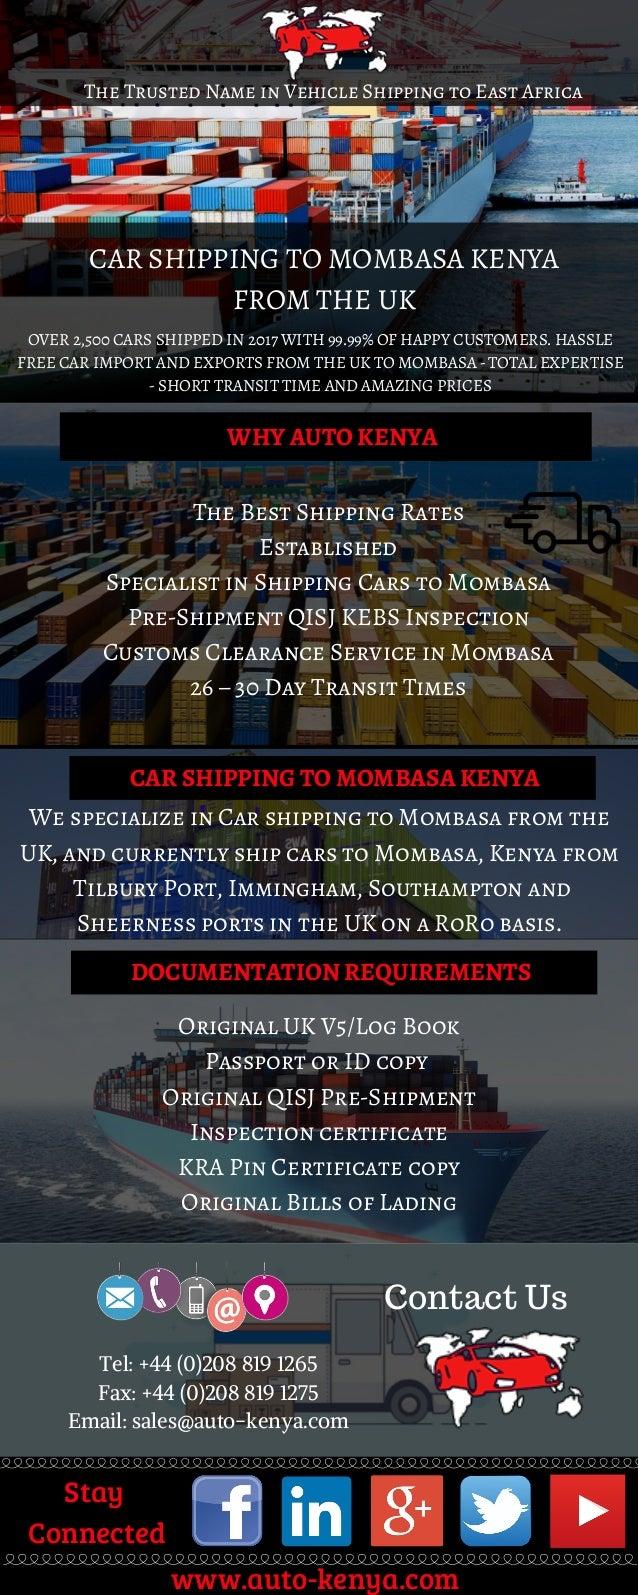 Auto-kenya Car Shipping Service